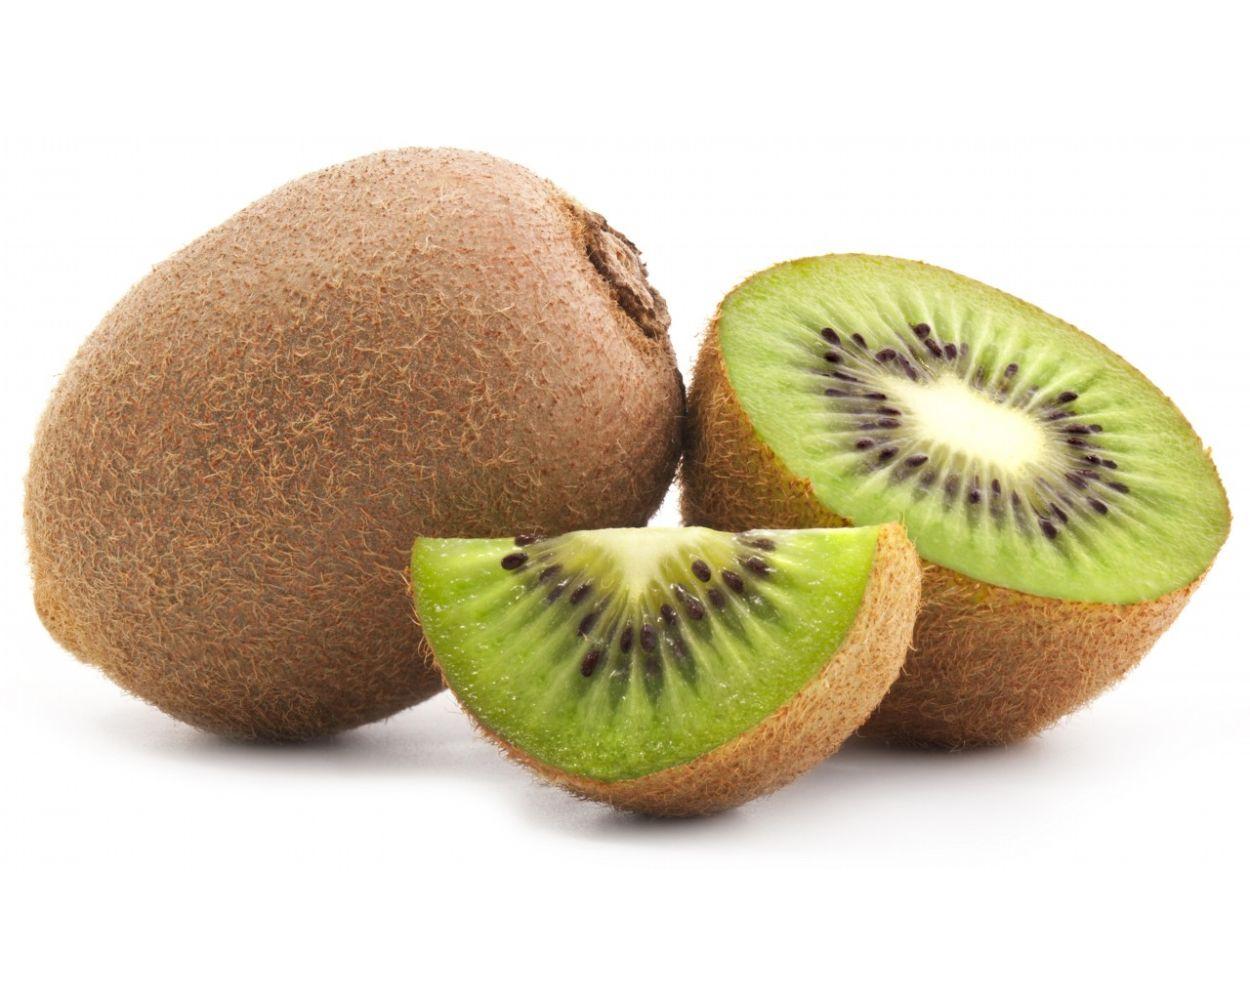 Kiwi Fruit 1kg 2 Hours Free Delivery Anywhere In Karachi Pakistan